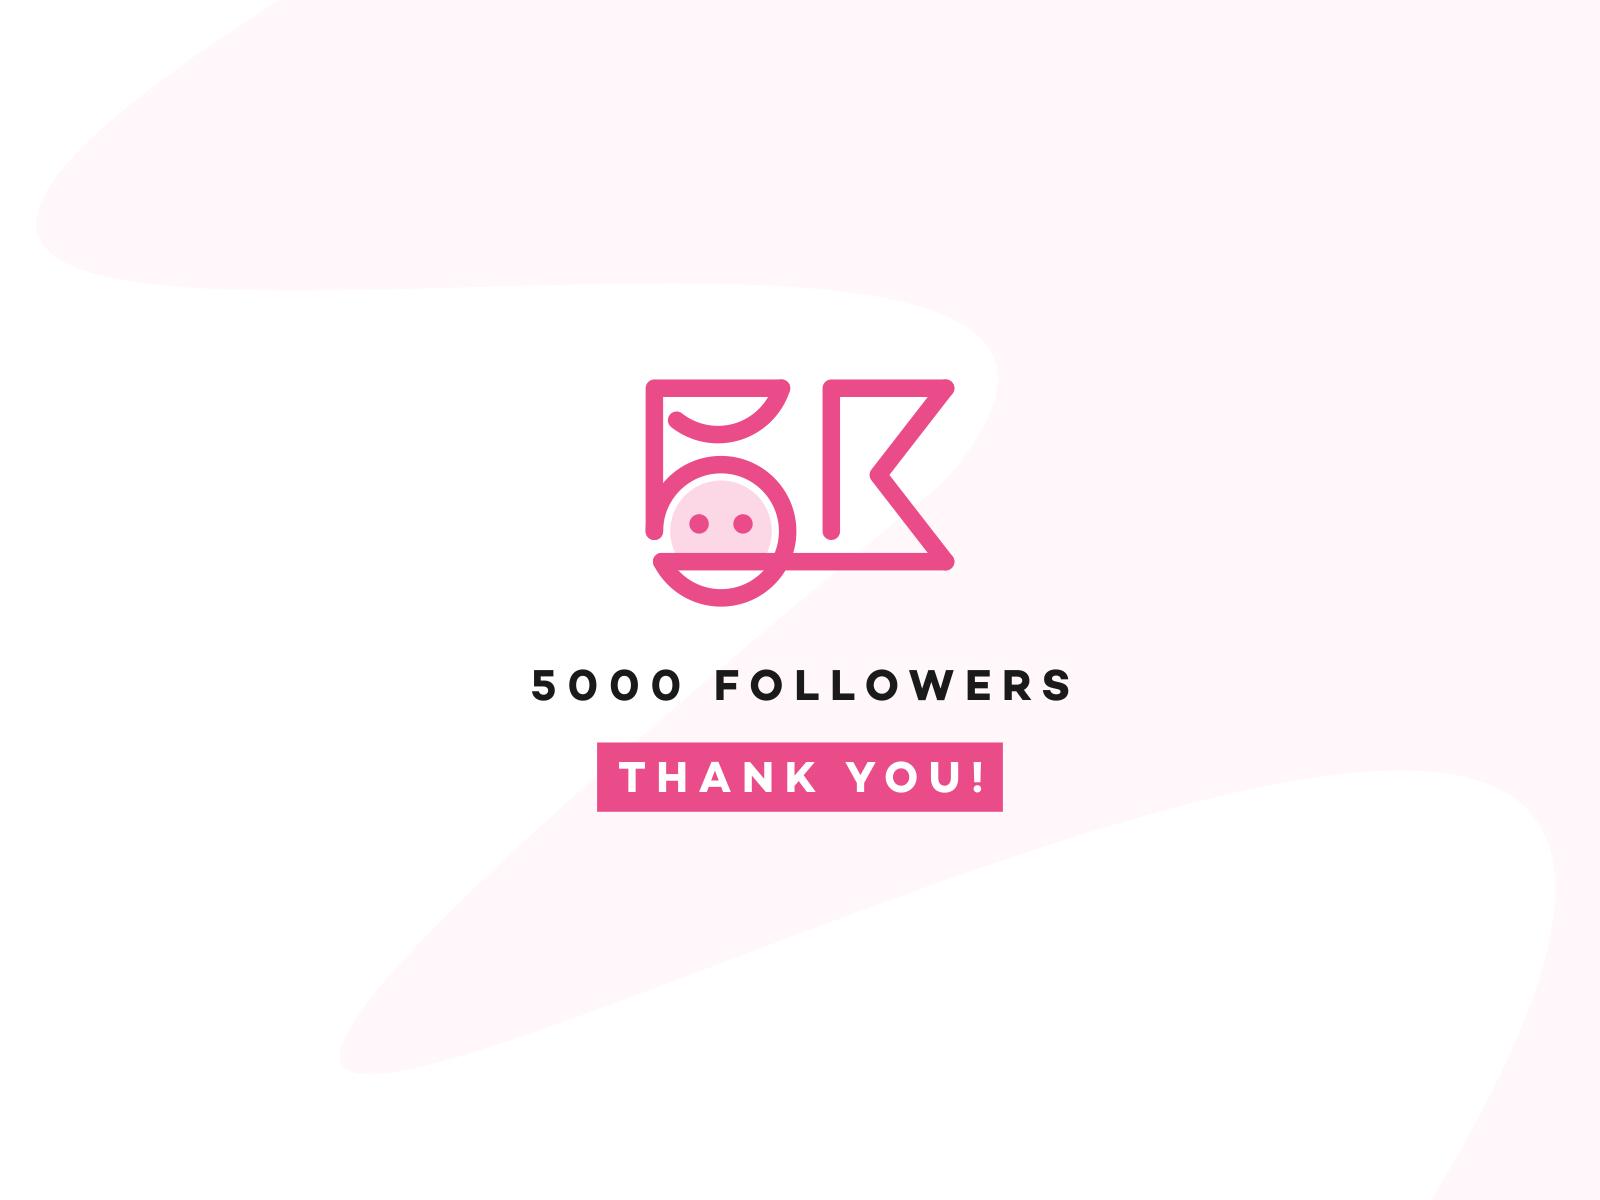 5k Followers likes appreciated appreciation follows followers thanks single line art line logo pink thousand five fans thank you dribbble 5000 k 5 5k